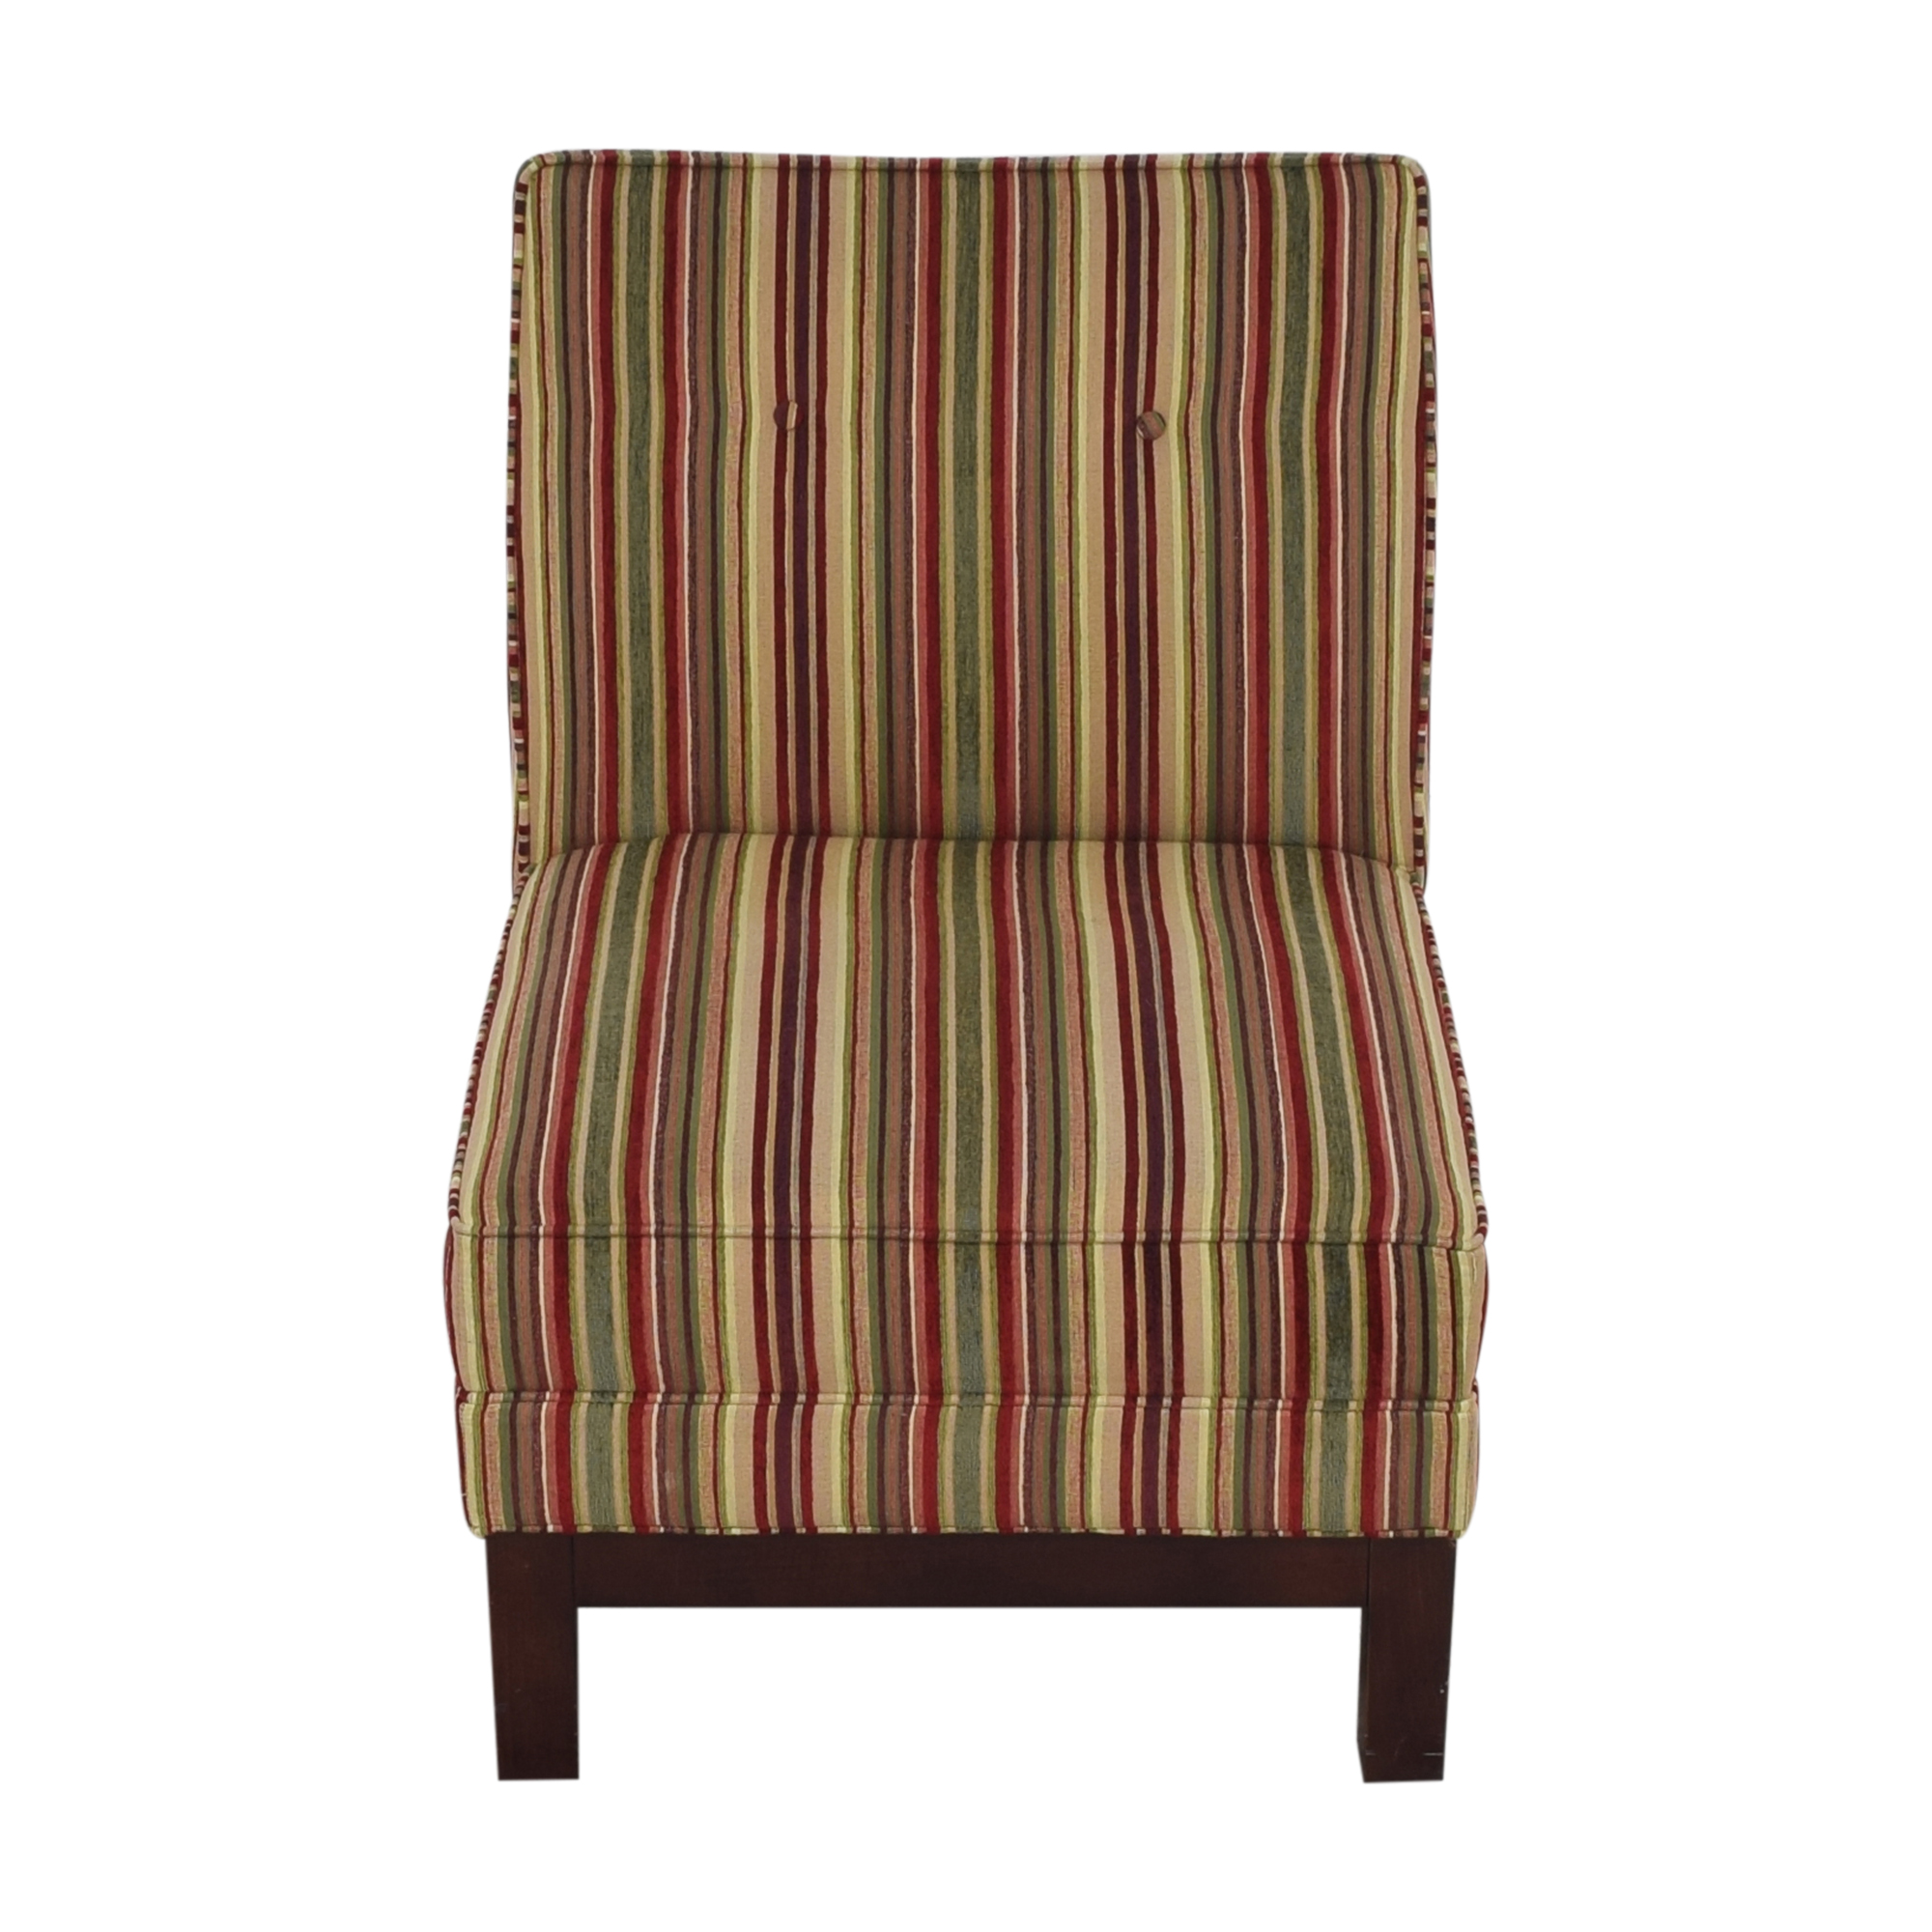 shop Mitchell Gold + Bob Williams Slipper Chair Mitchell Gold + Bob Williams